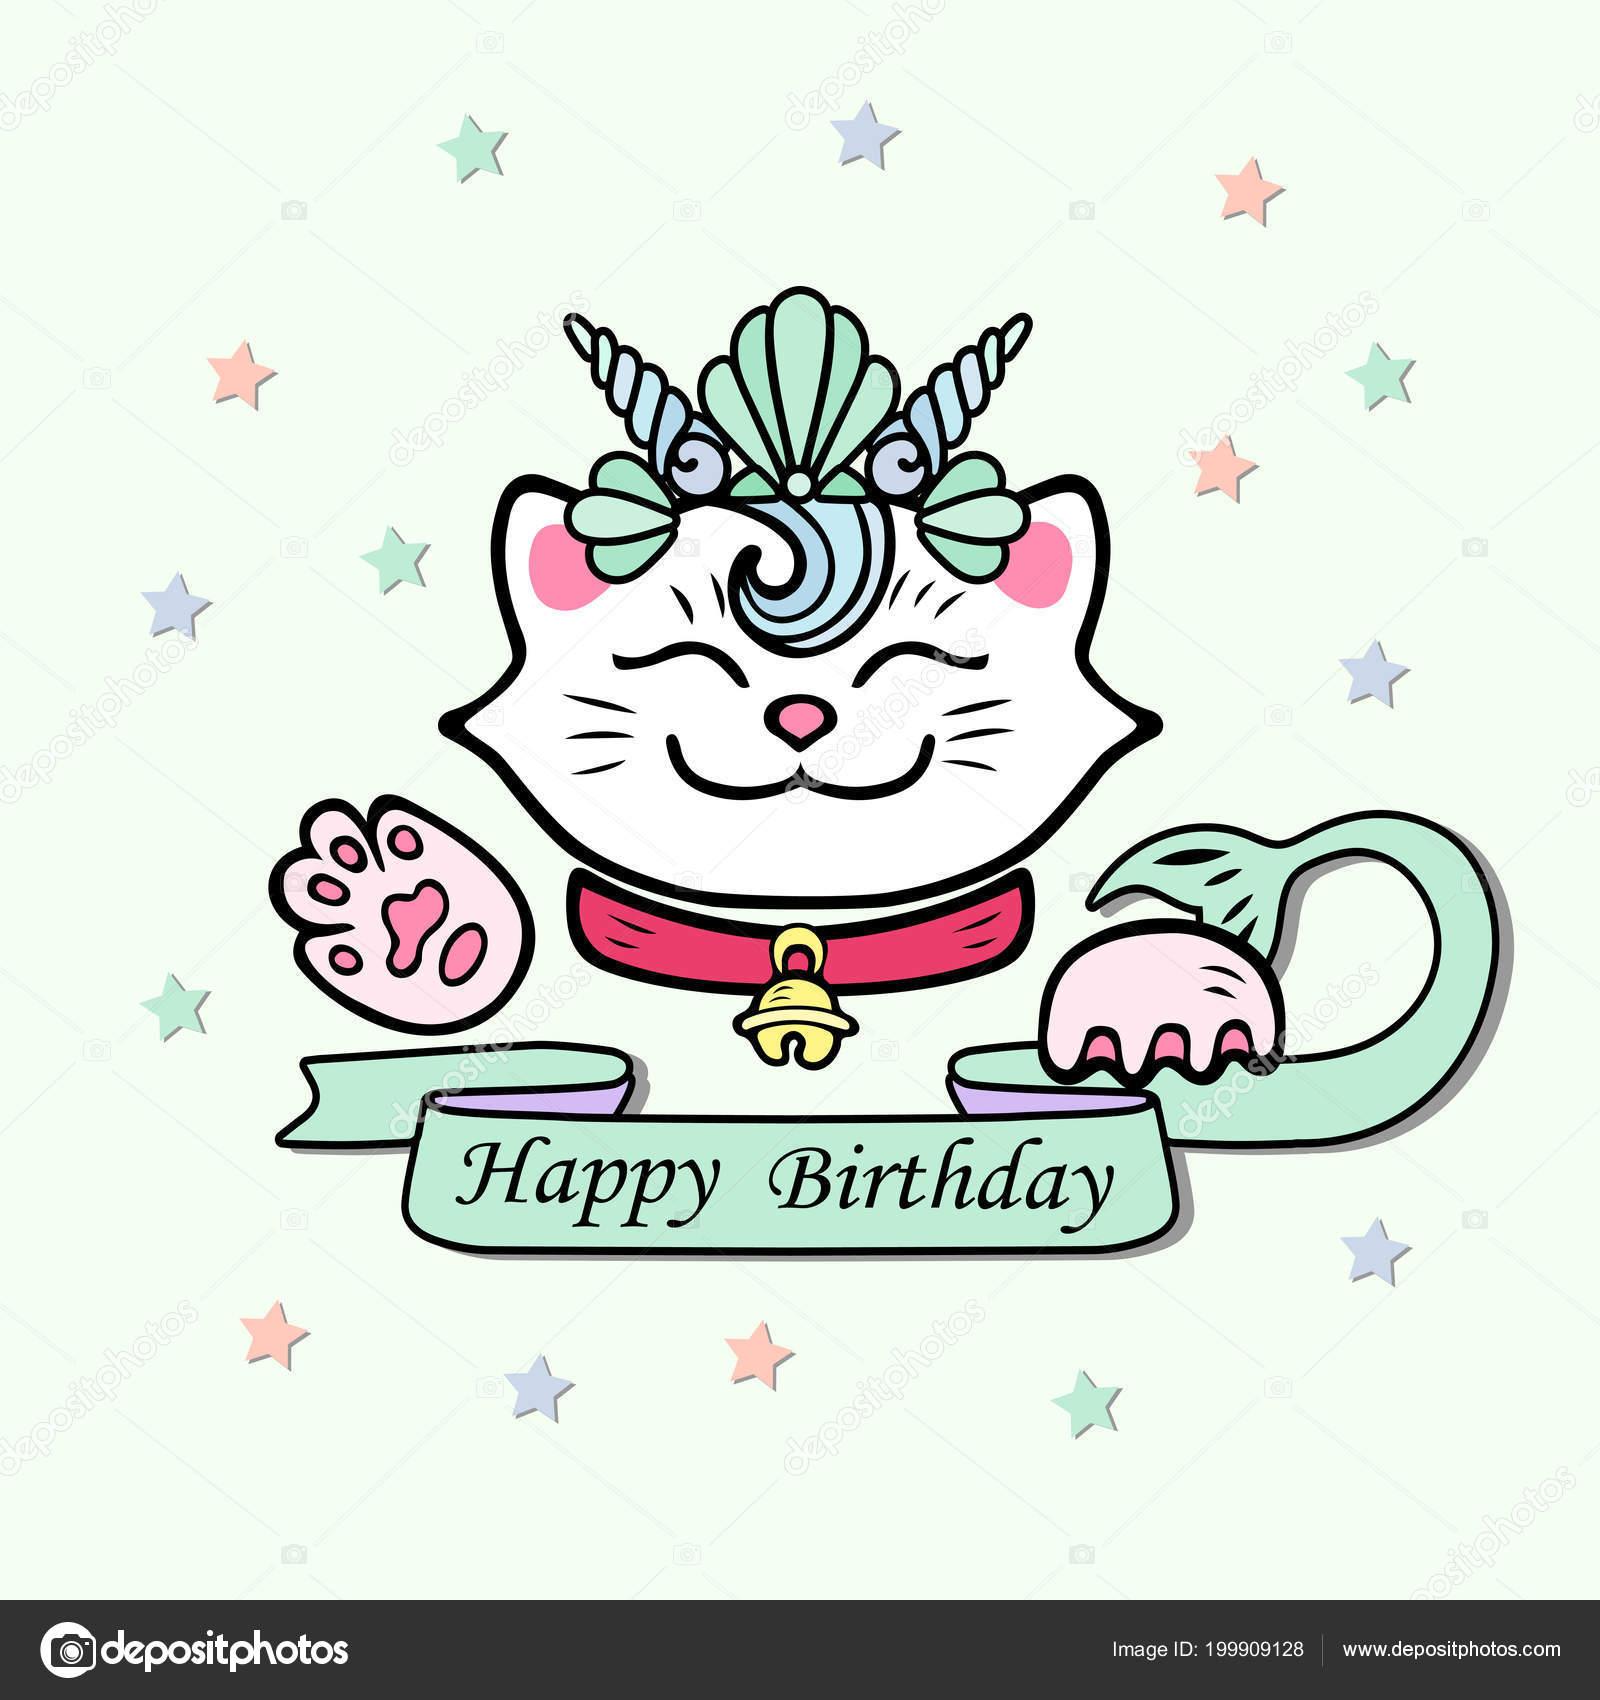 Cute Happy Birthday Card Cat Marimaid Sea Shell Crown Vector Stock